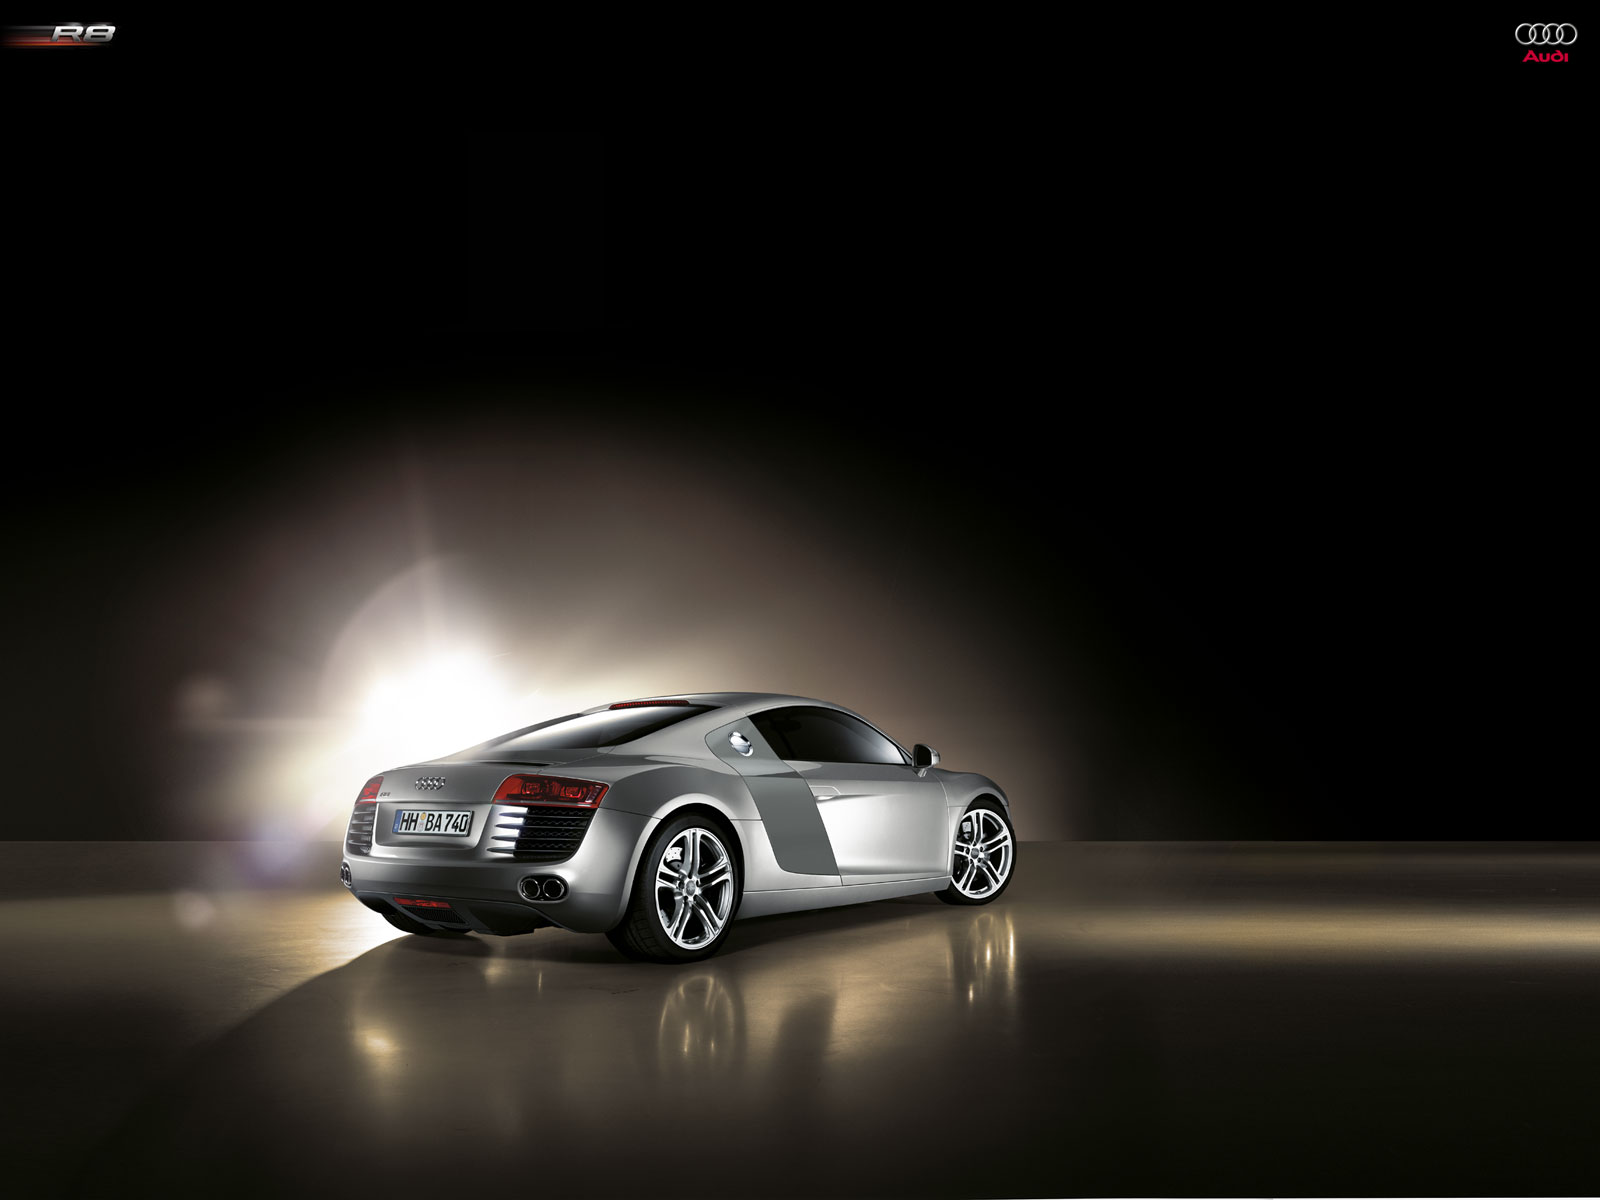 Full Wallpaper Fond D Ecran Voitures Audi R8 Image Et